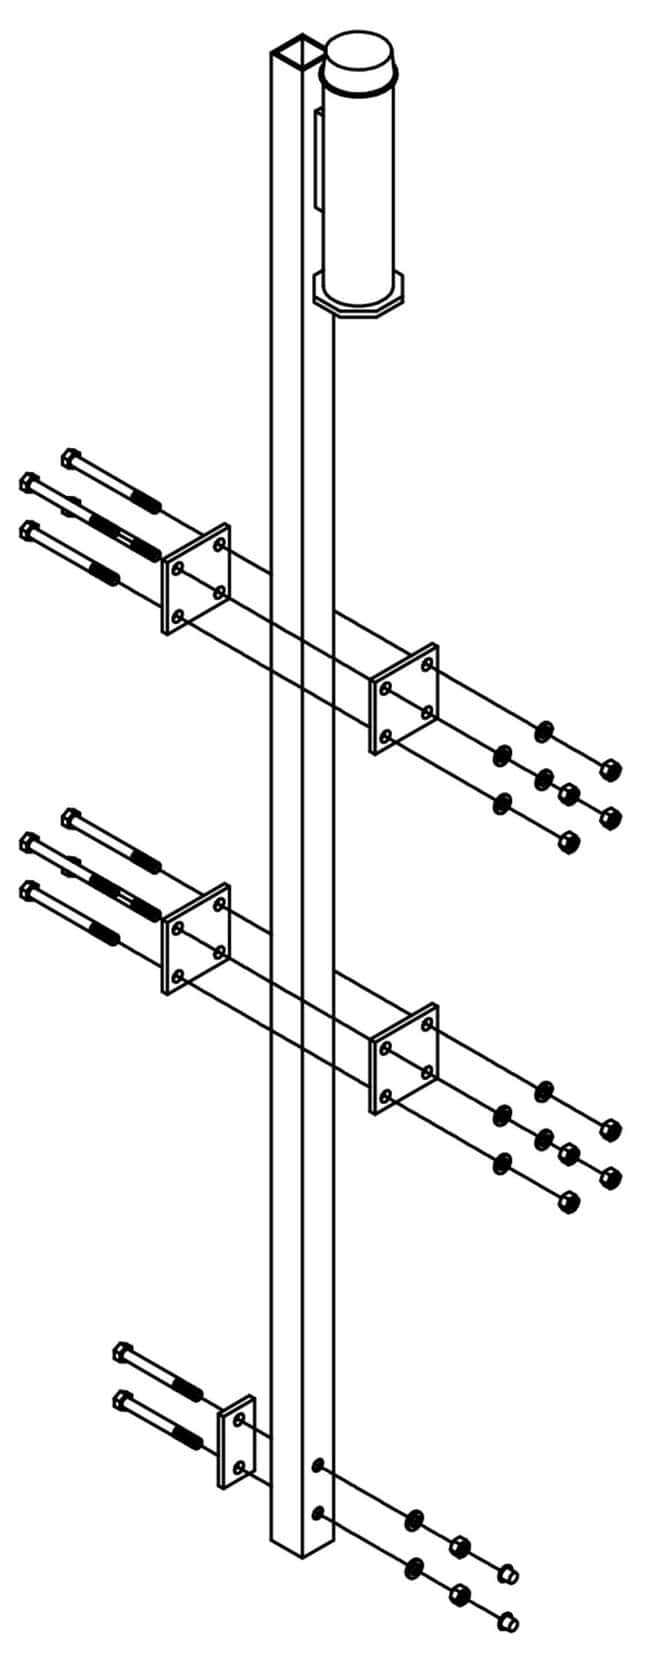 3M™DBI-SALA™ Lad-Saf™ Bracket